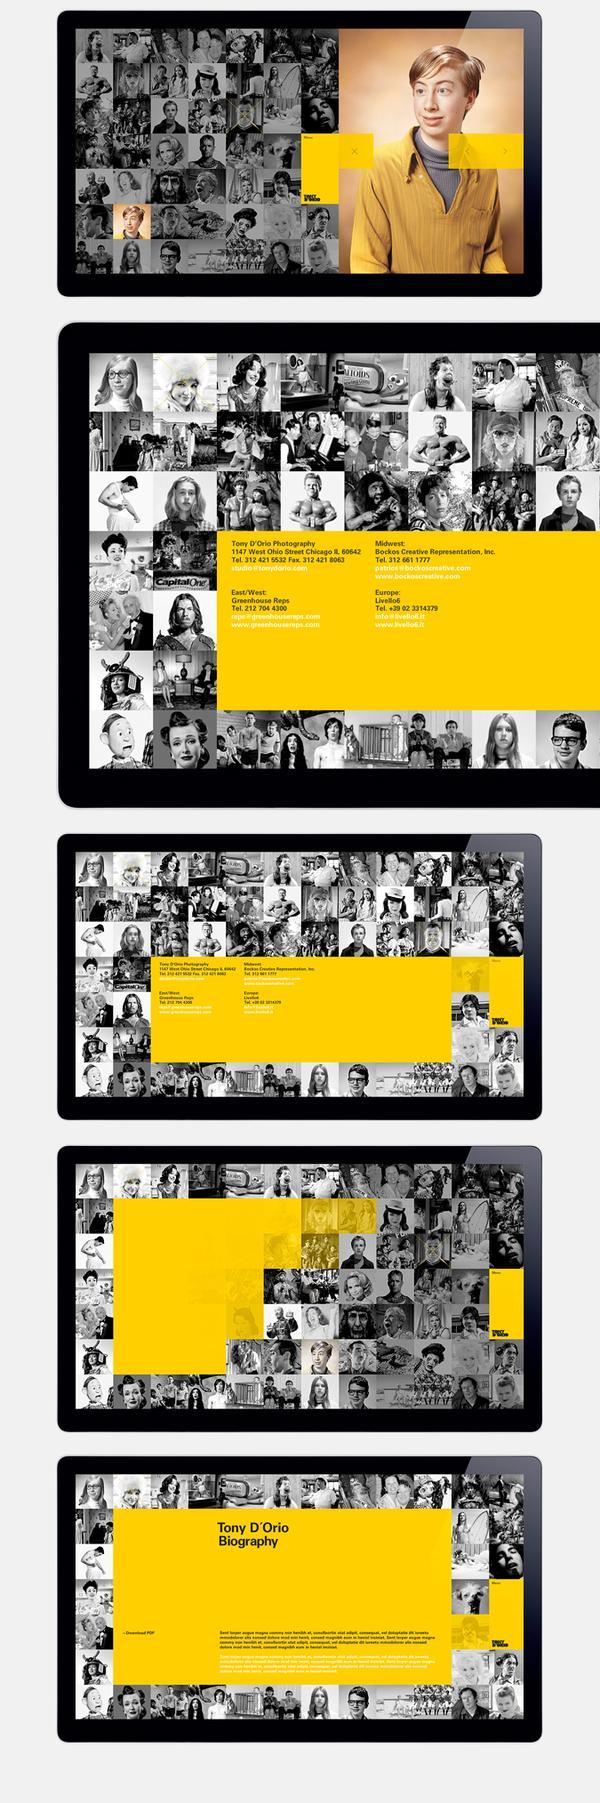 Web design inspiration   #213 « From up North   Design inspiration & news